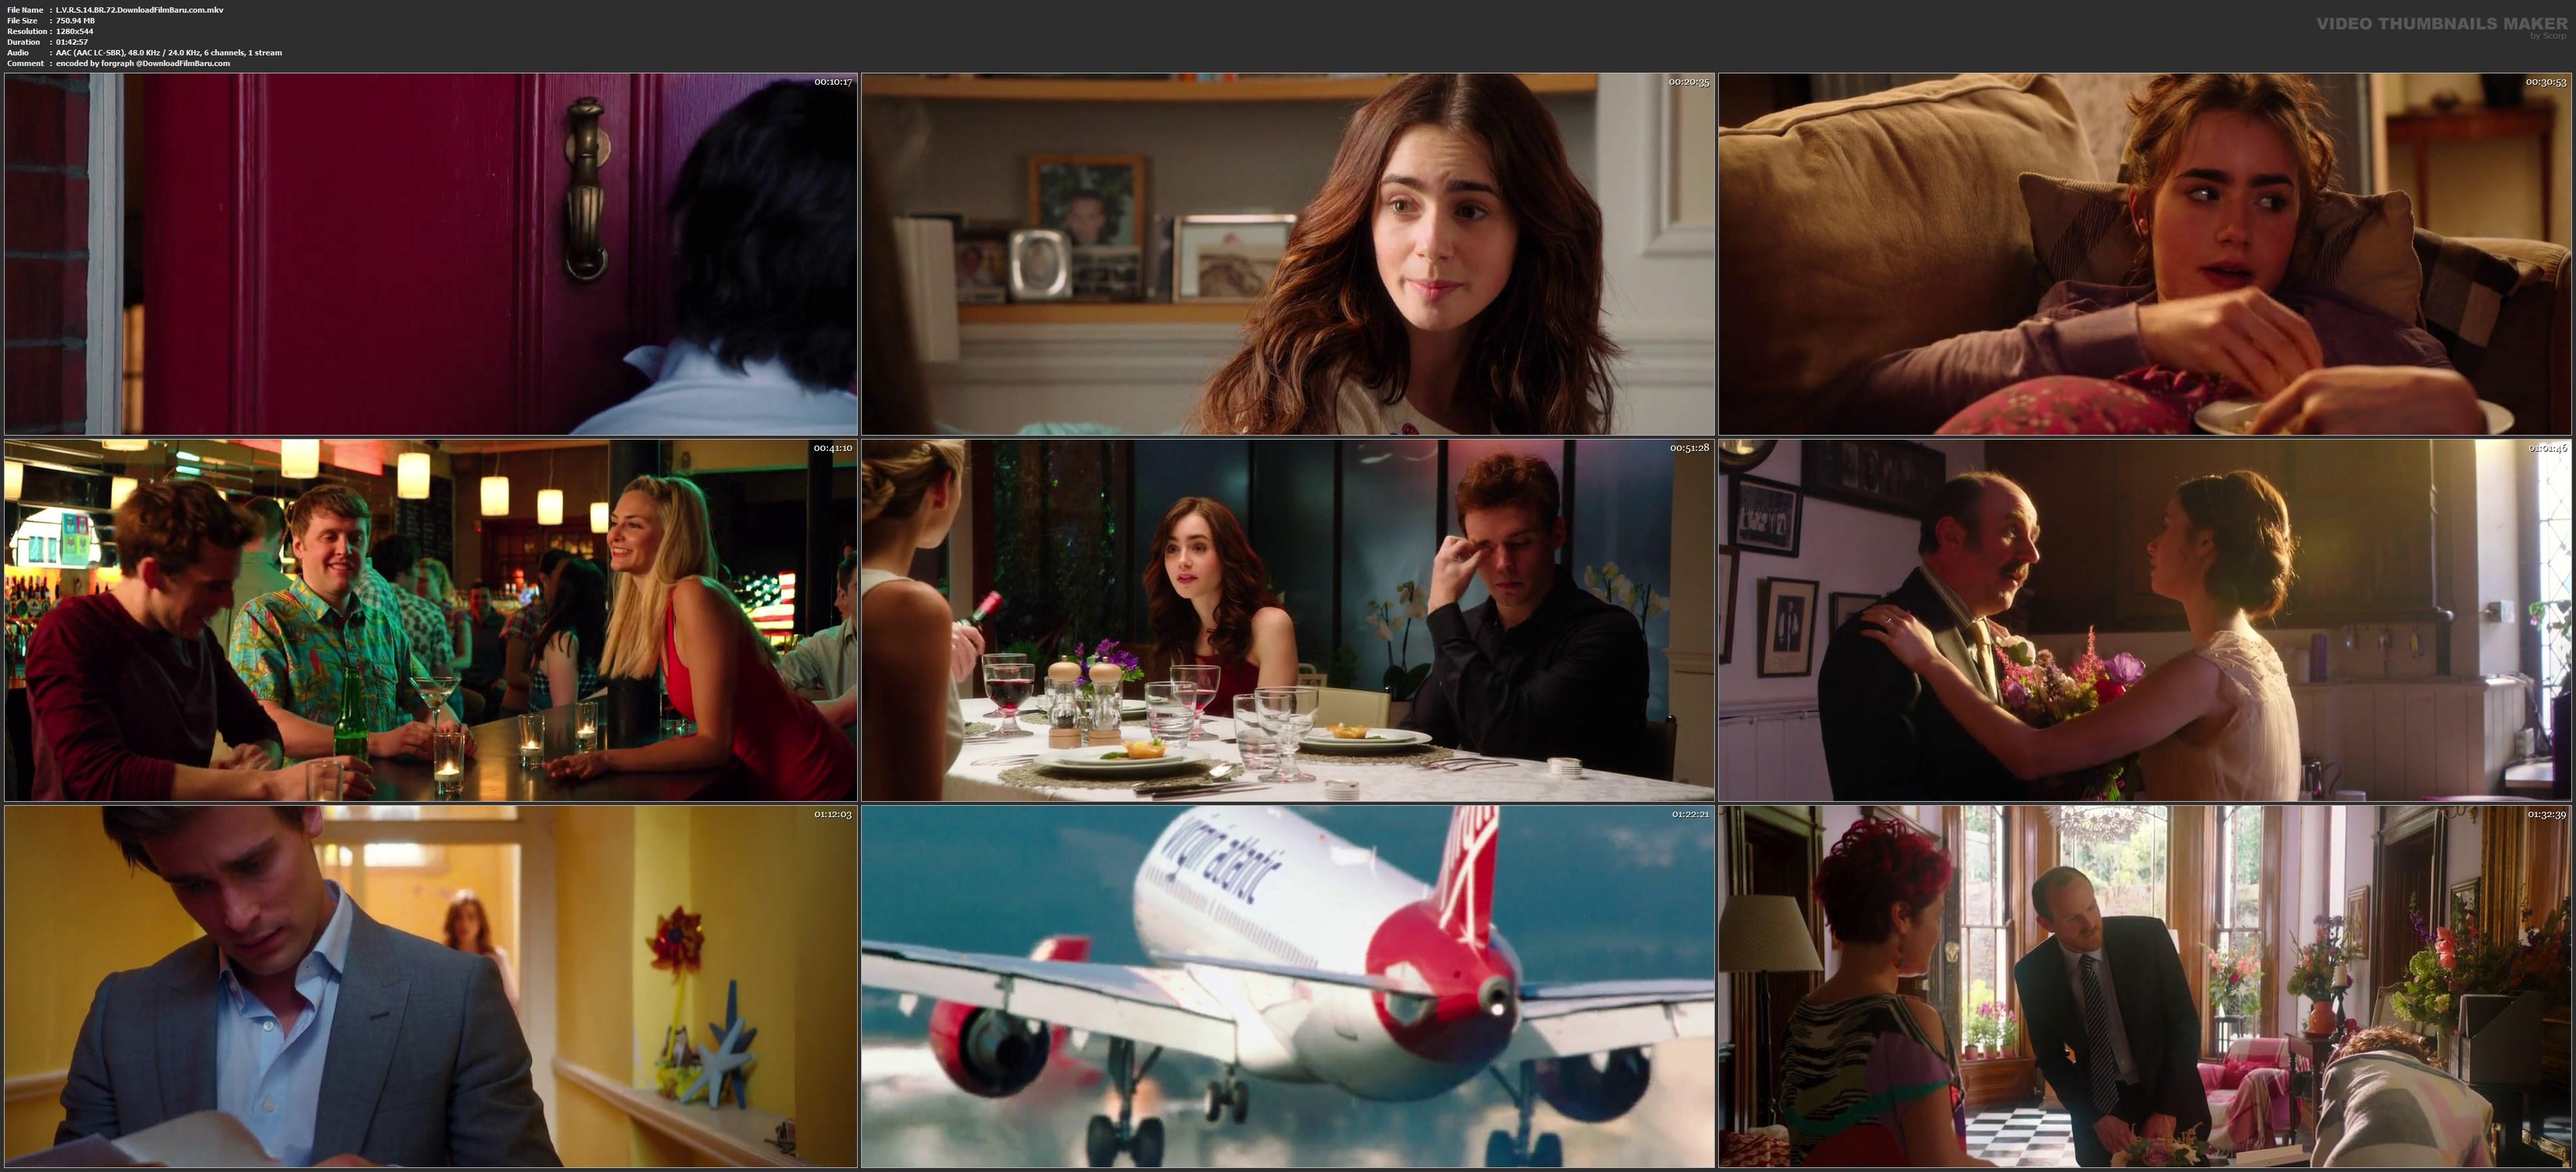 Love, Rosie (2014) Screenshots